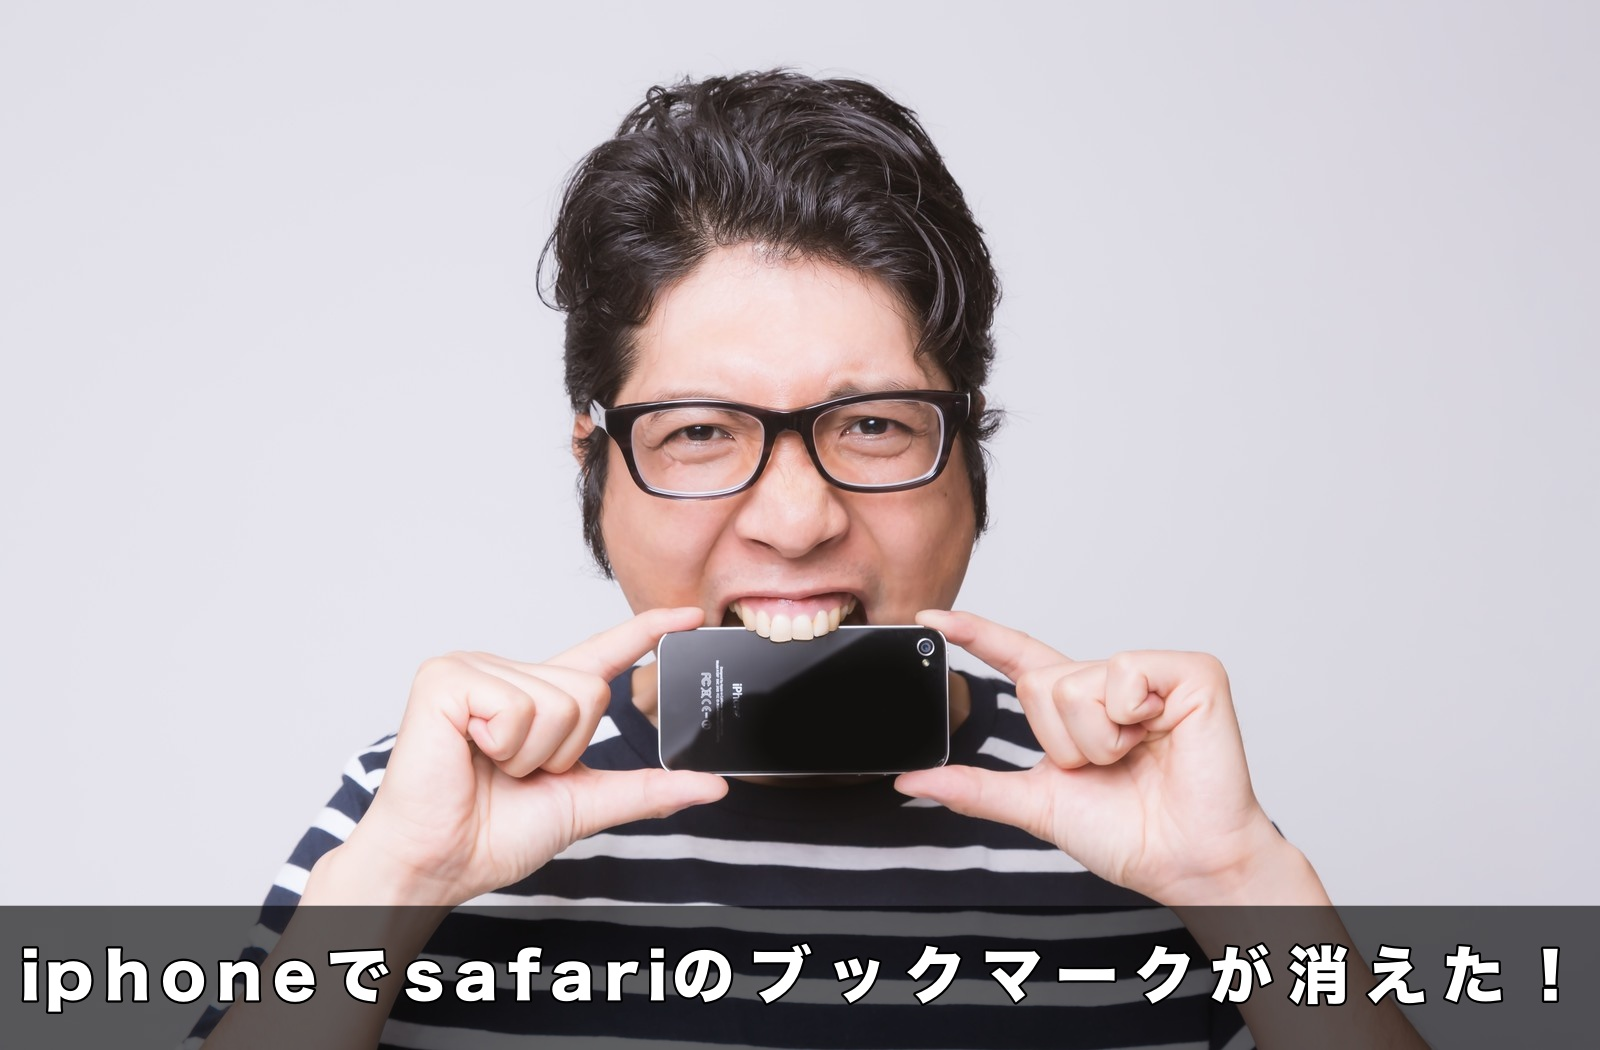 iphoneでsafariのブックマークが消えた時の復元方法!